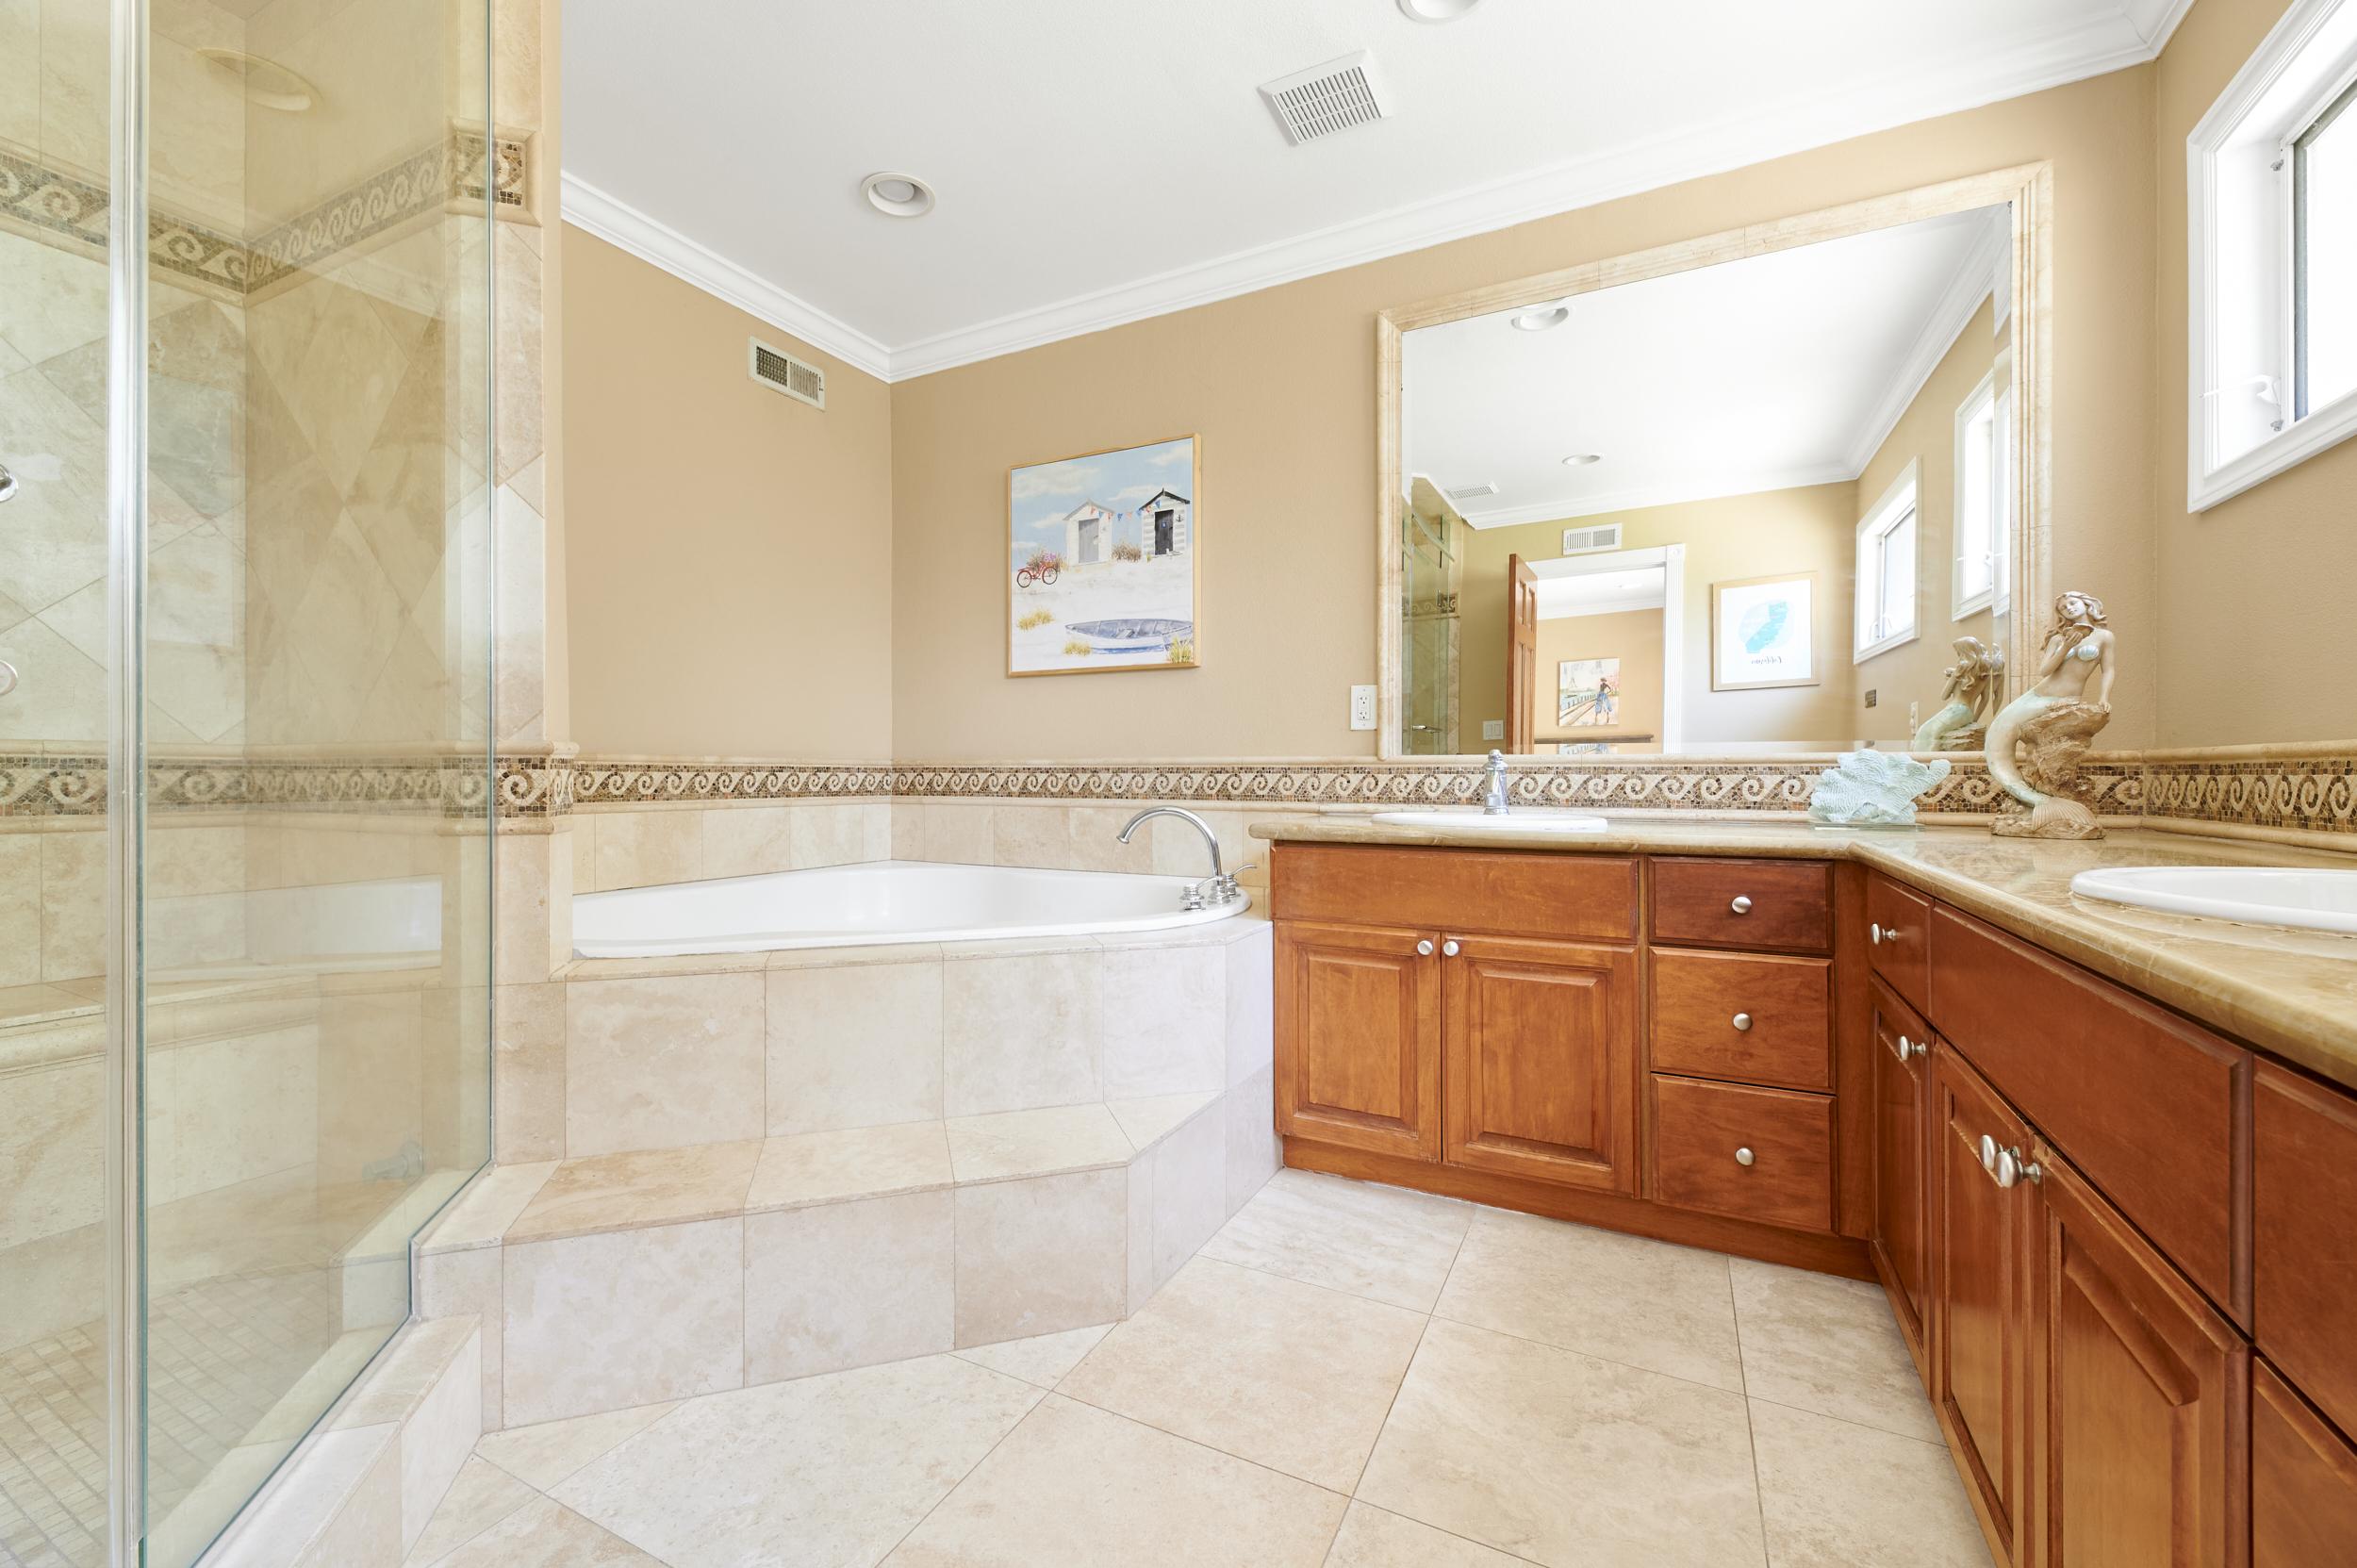 https://secureservercdn.net/198.71.233.107/zgw.2cd.myftpupload.com/wp-content/uploads/2020/08/Gratitude-Lodge-Newport-BeachGround-Floor-Master-Bedroom-Bathroom.jpg?time=1607134972